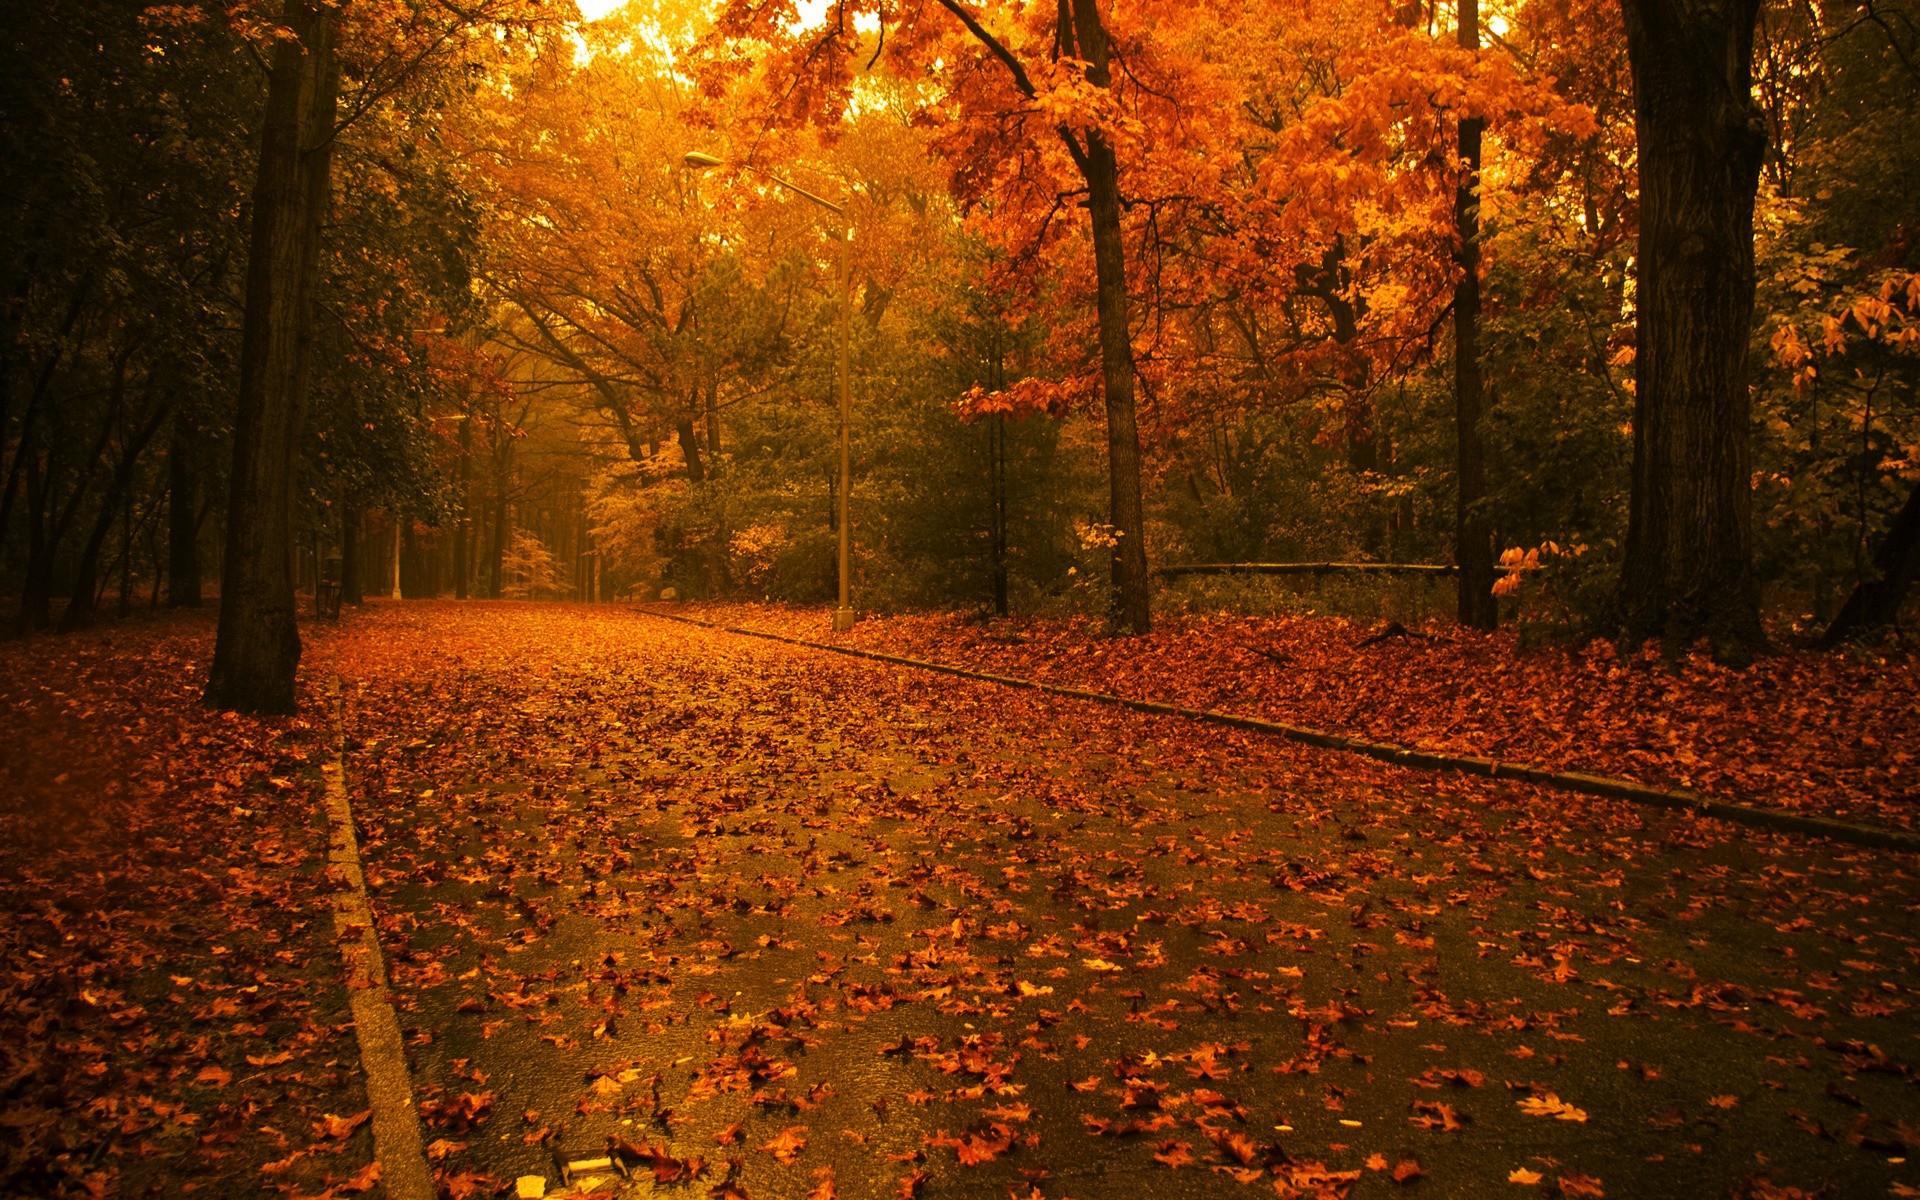 Fall Screensavers and Desktop Backgrounds